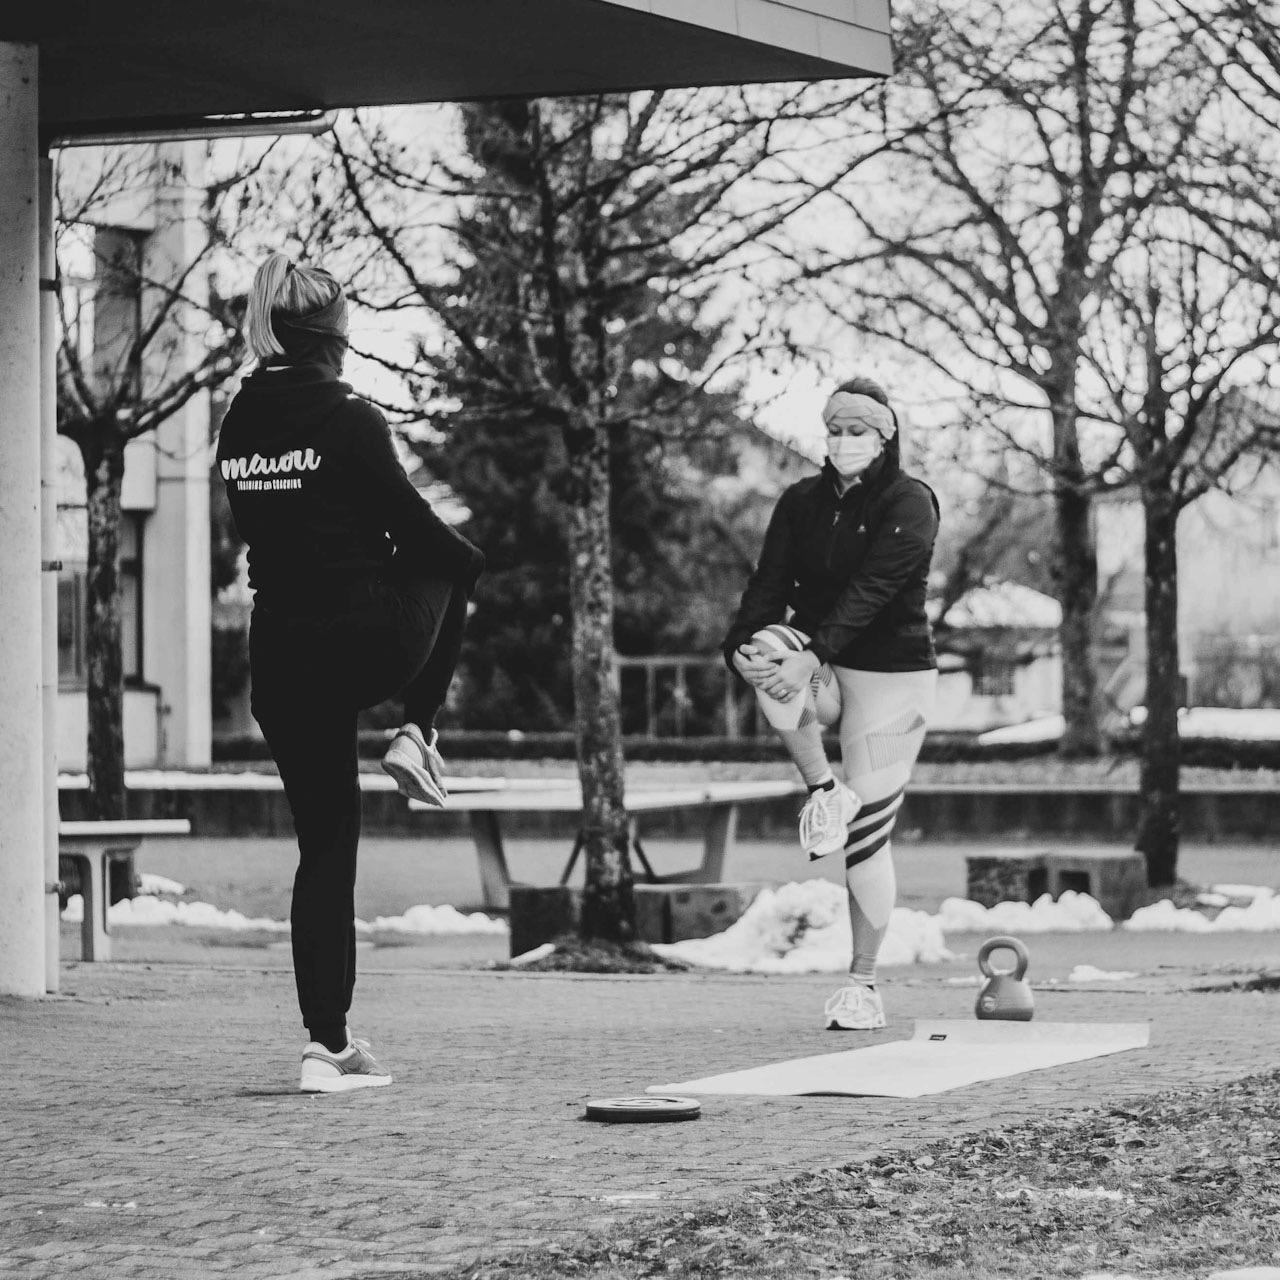 Malou Training and Coaching Outdoor Personal Training Niederbipp an der frischen Luft